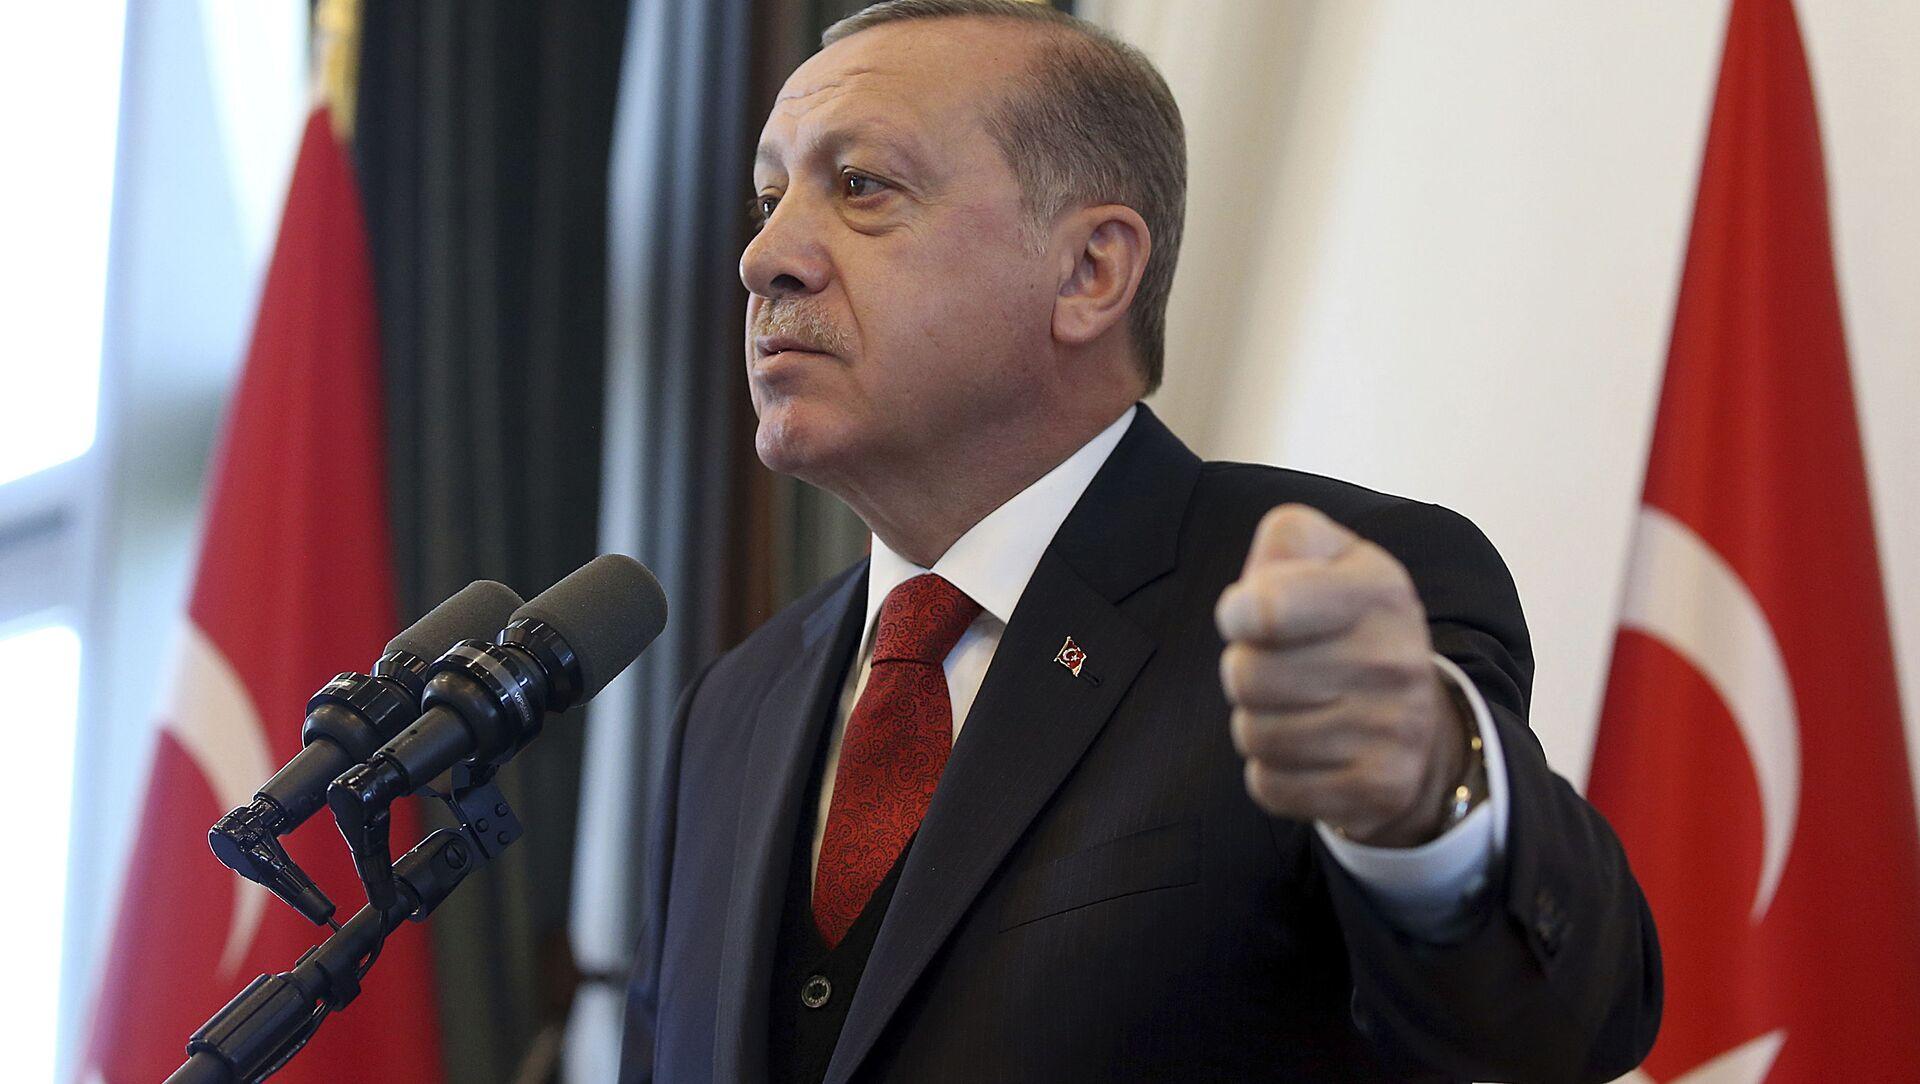 Turecký prezident Recep Tayyip Erdogan - Sputnik Česká republika, 1920, 21.03.2021